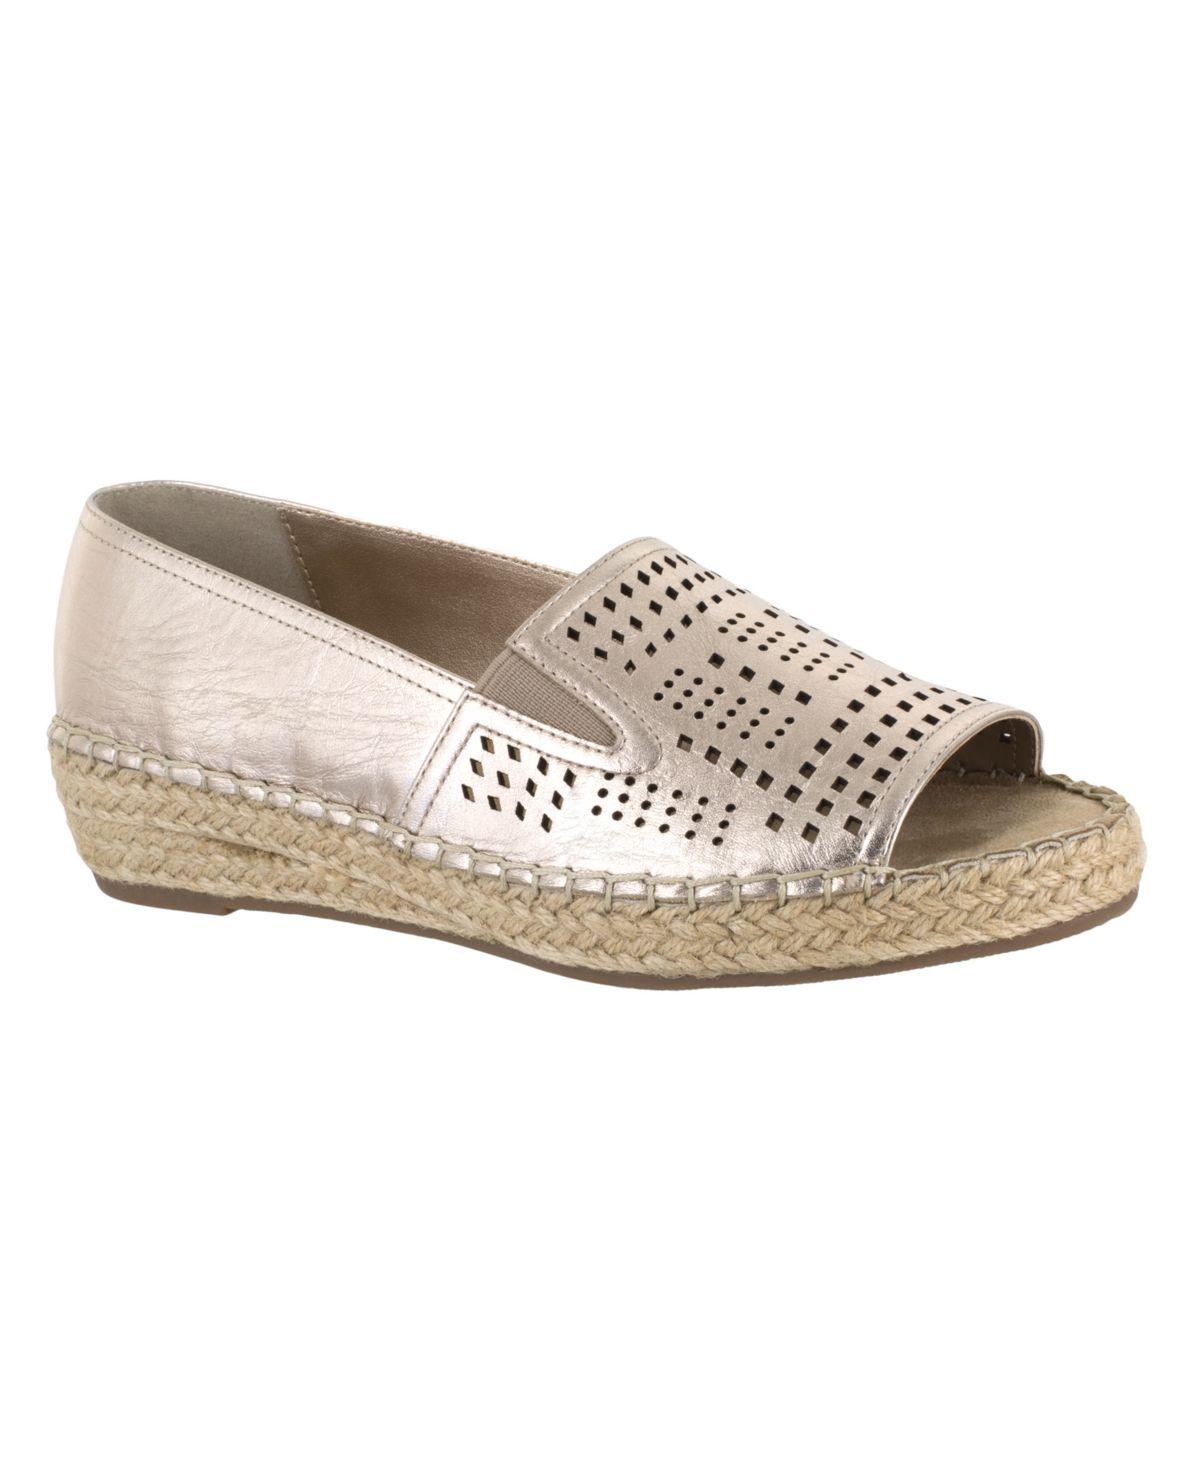 Bella vita cora peeptoe espadrille sandals reviews